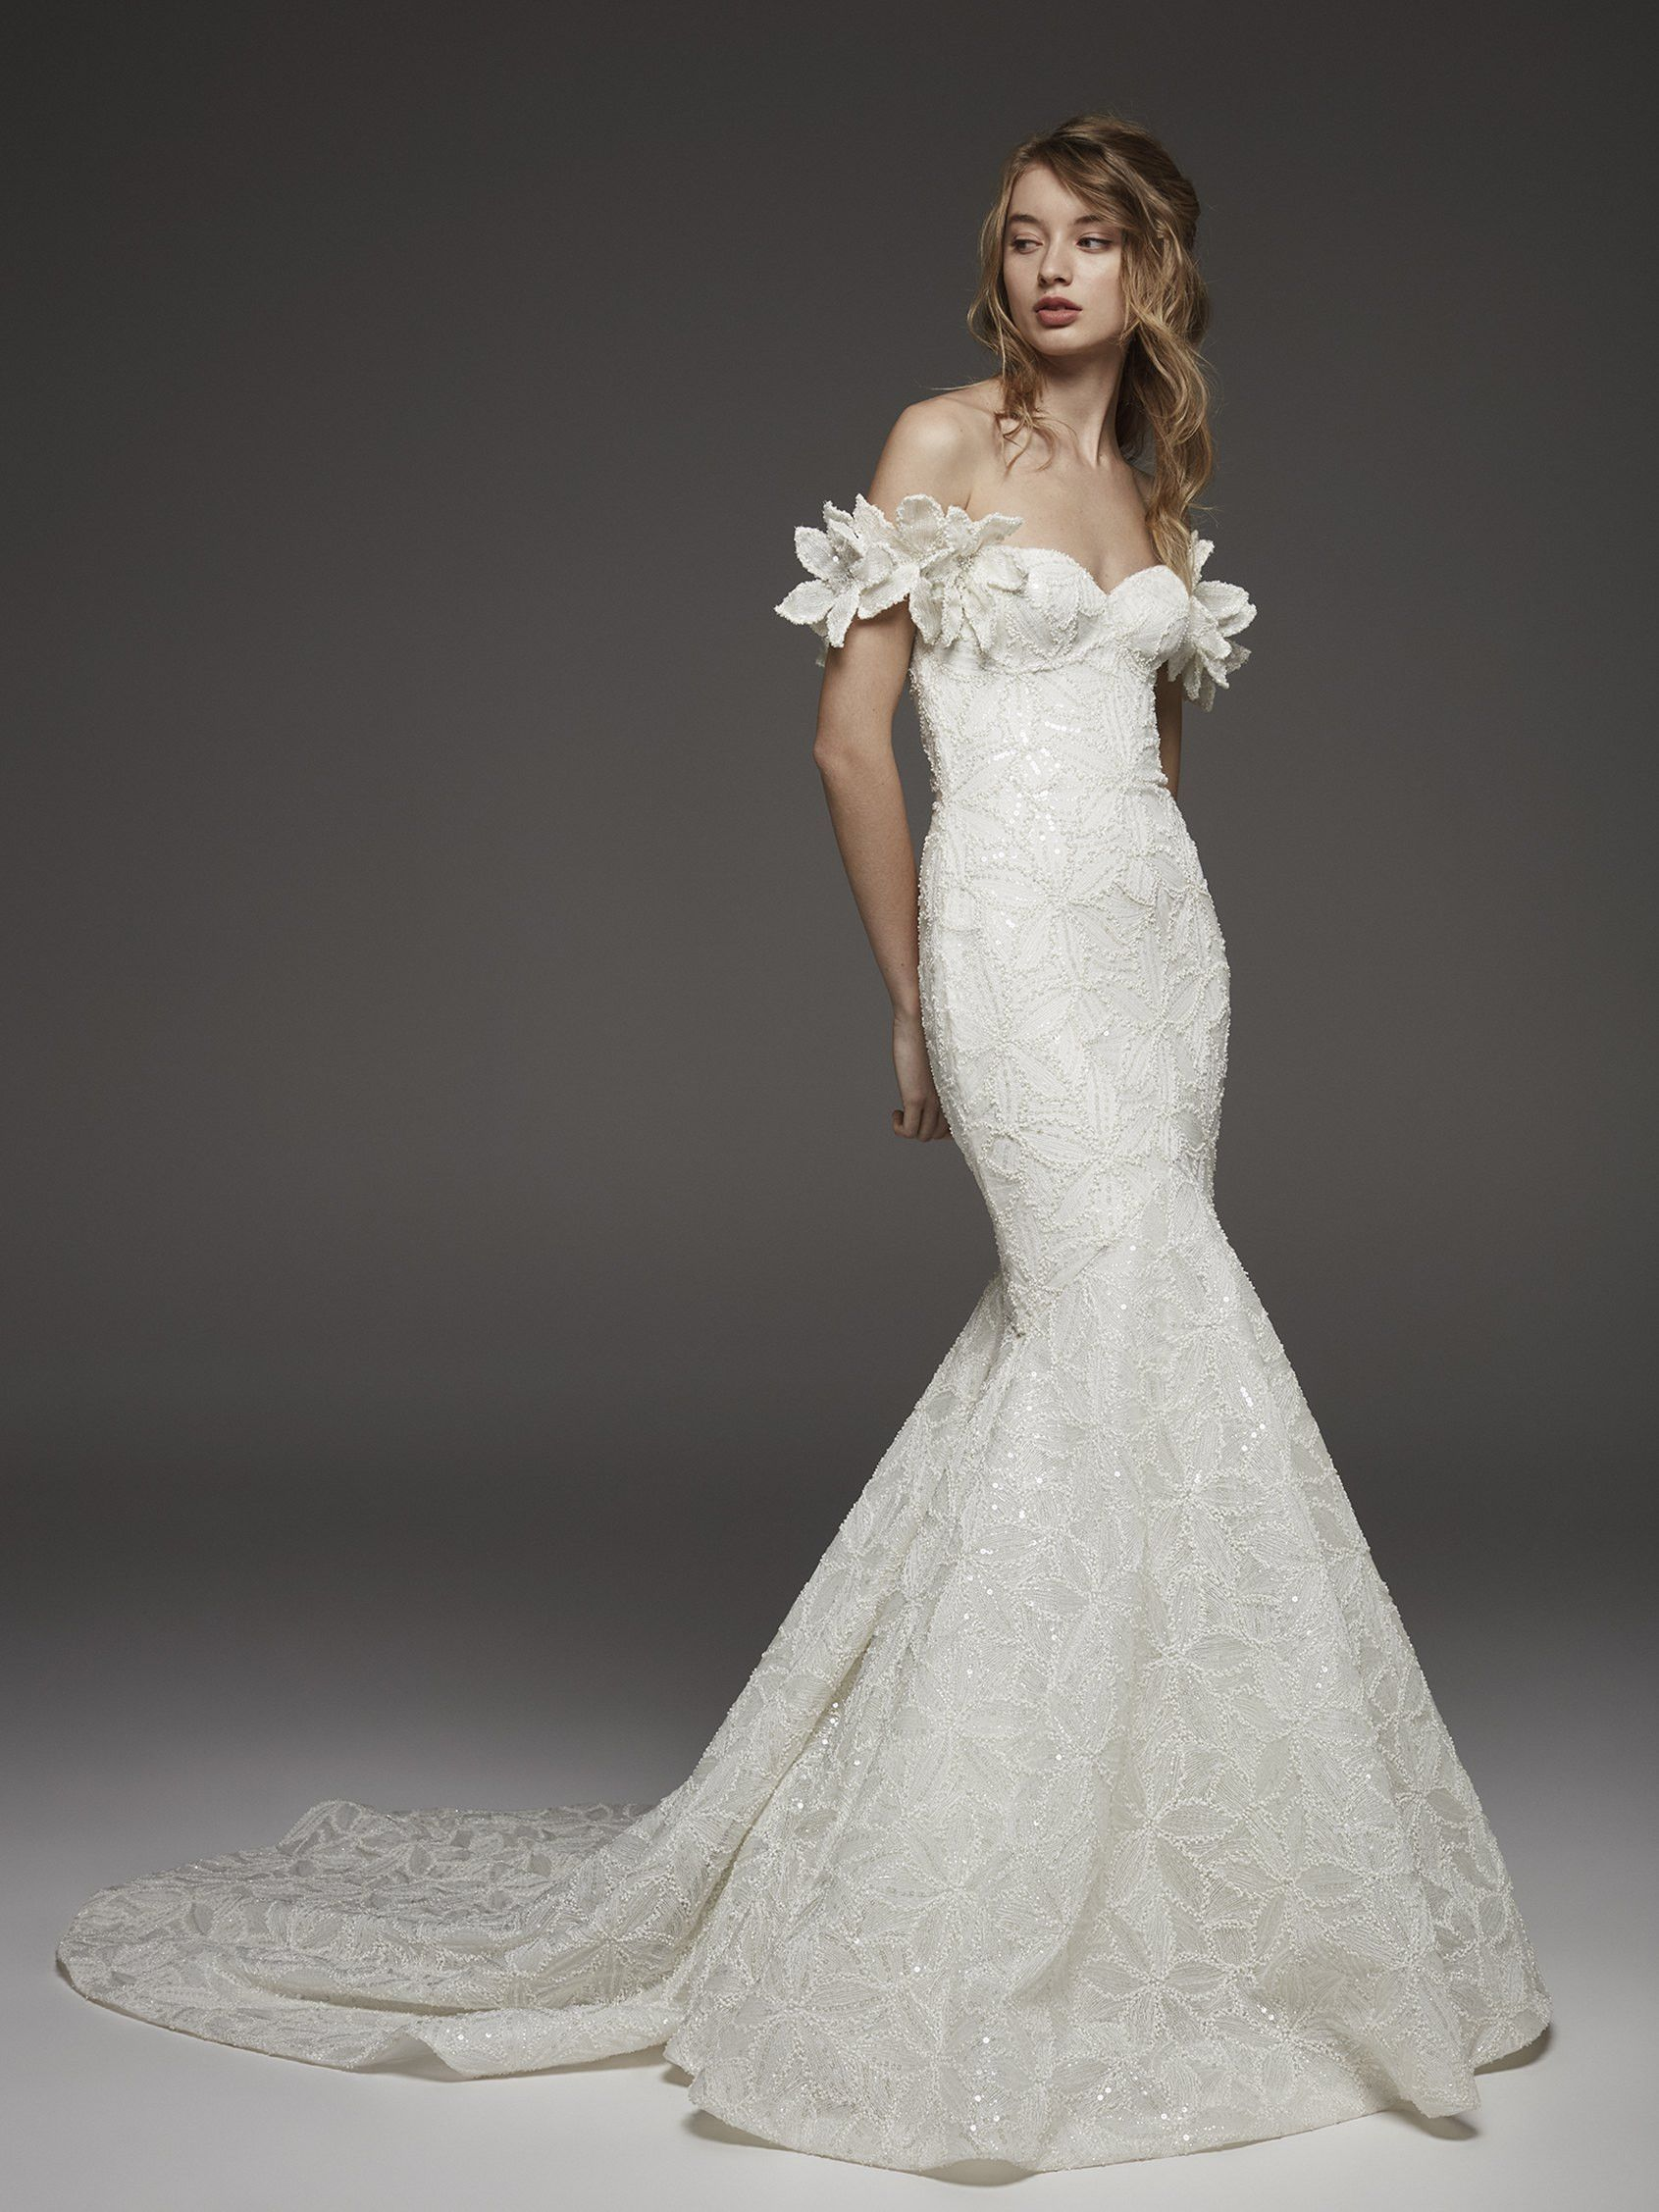 51c7ca4d31b0 Atelier Pronovias HECHIZO – Ellie s Bridal Boutique (Alexandria